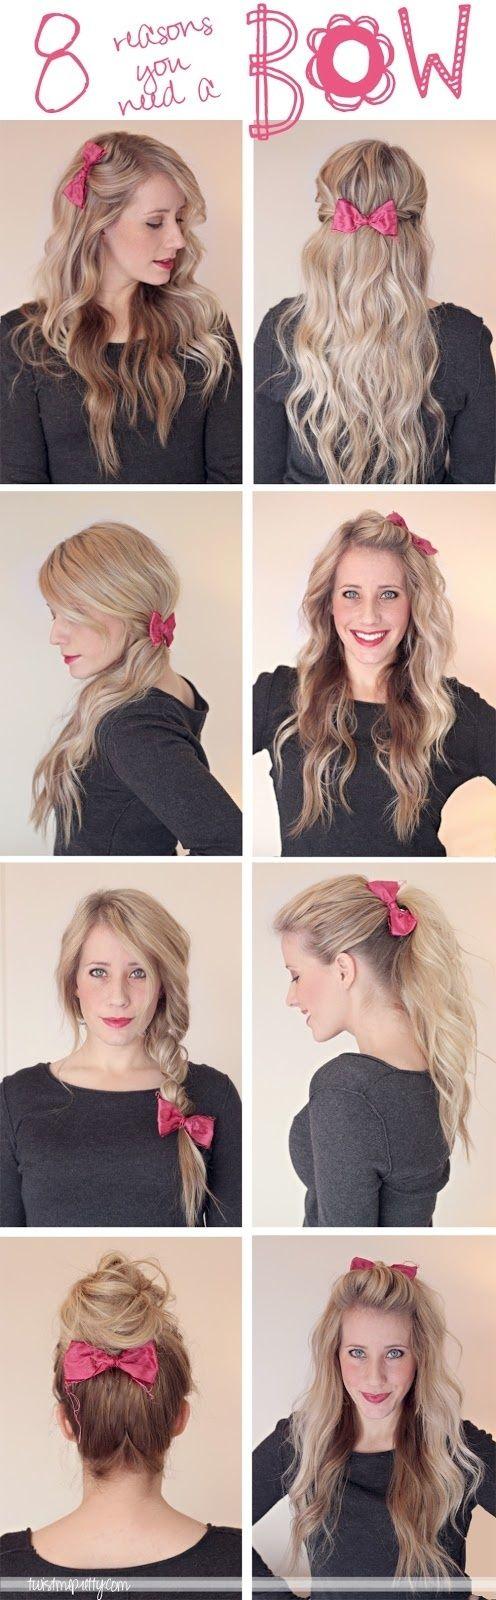 8 ways to wear a bow